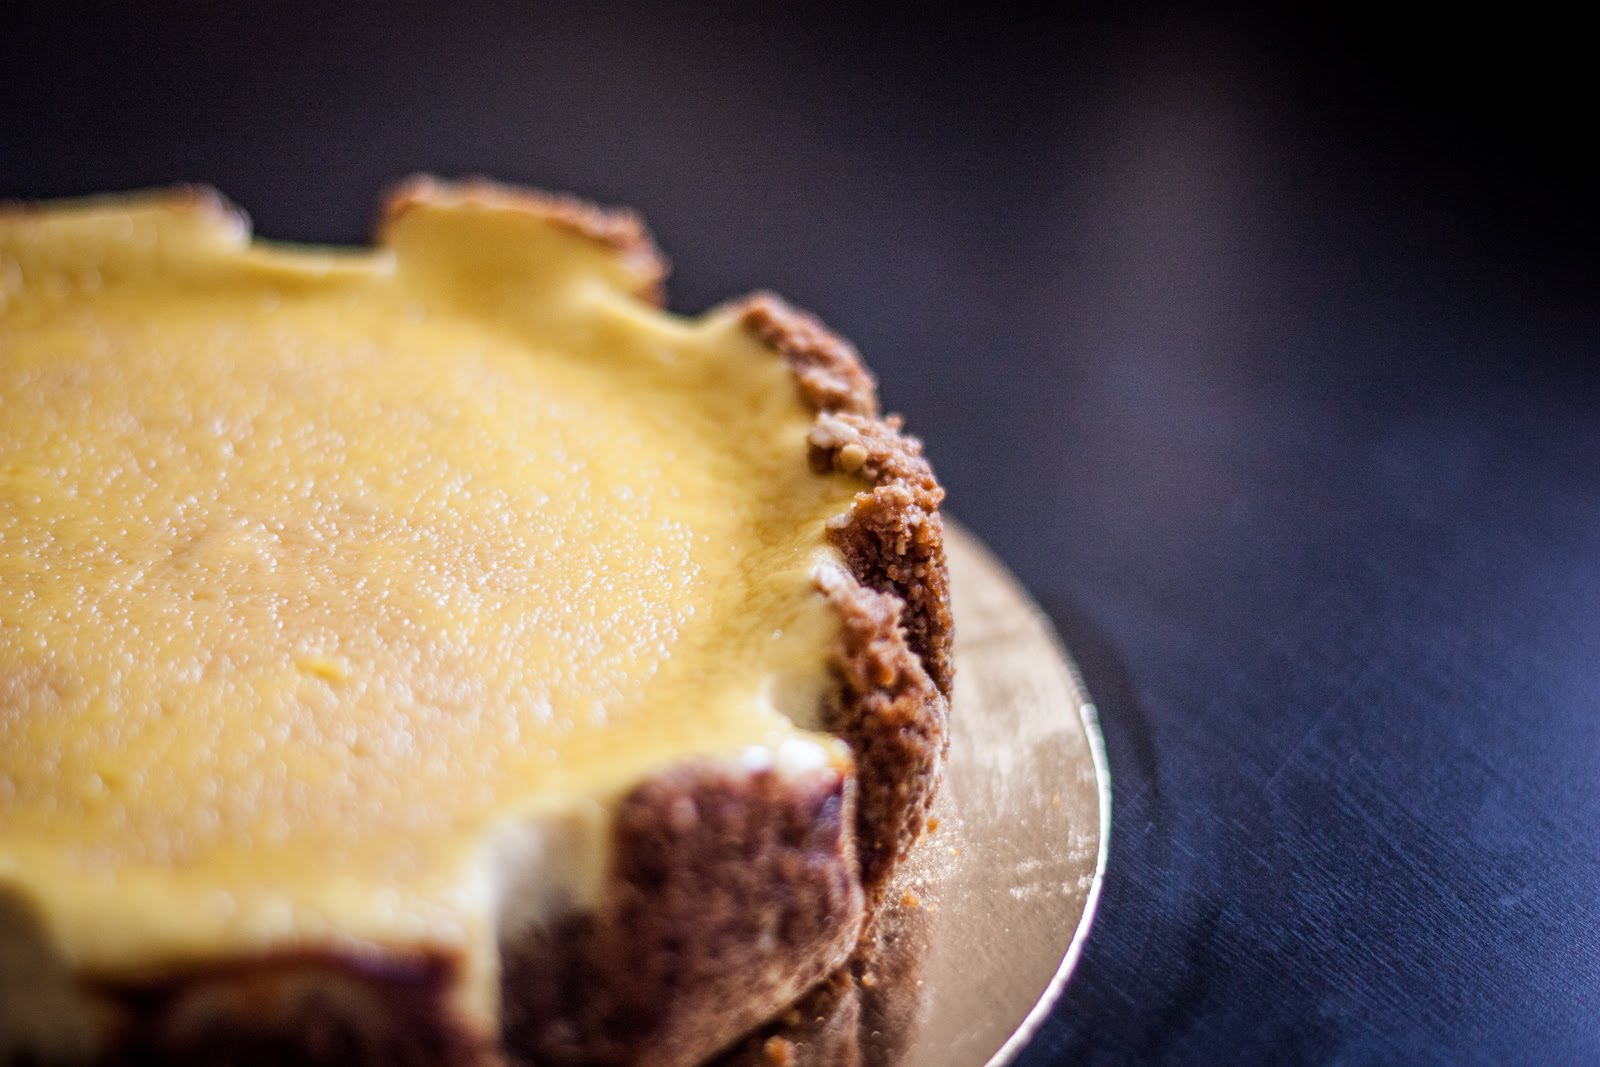 Okraj cheesecaku s krémem z mascarpone.